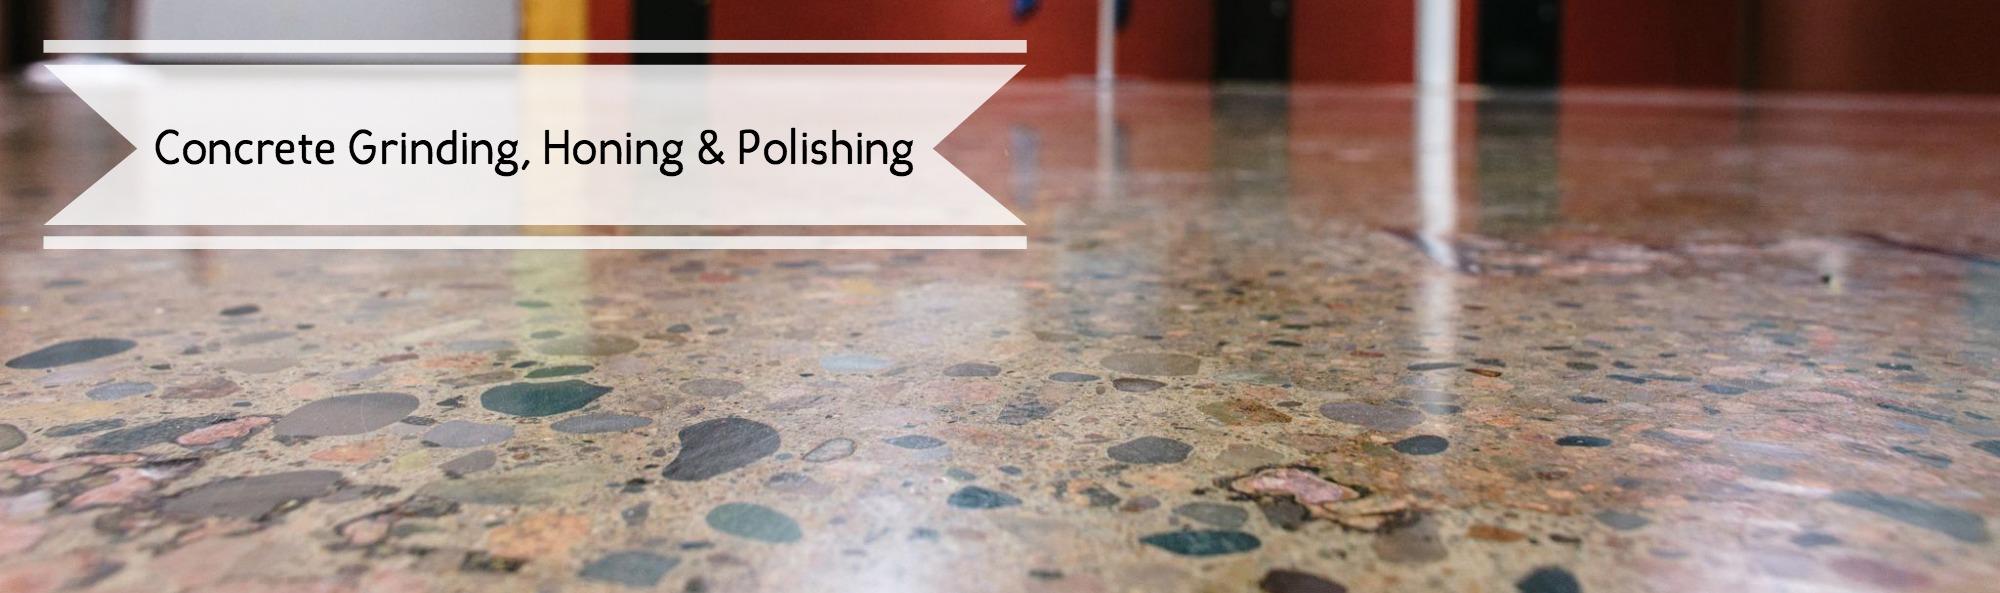 Concrete Grinding Honing & Polishing Process